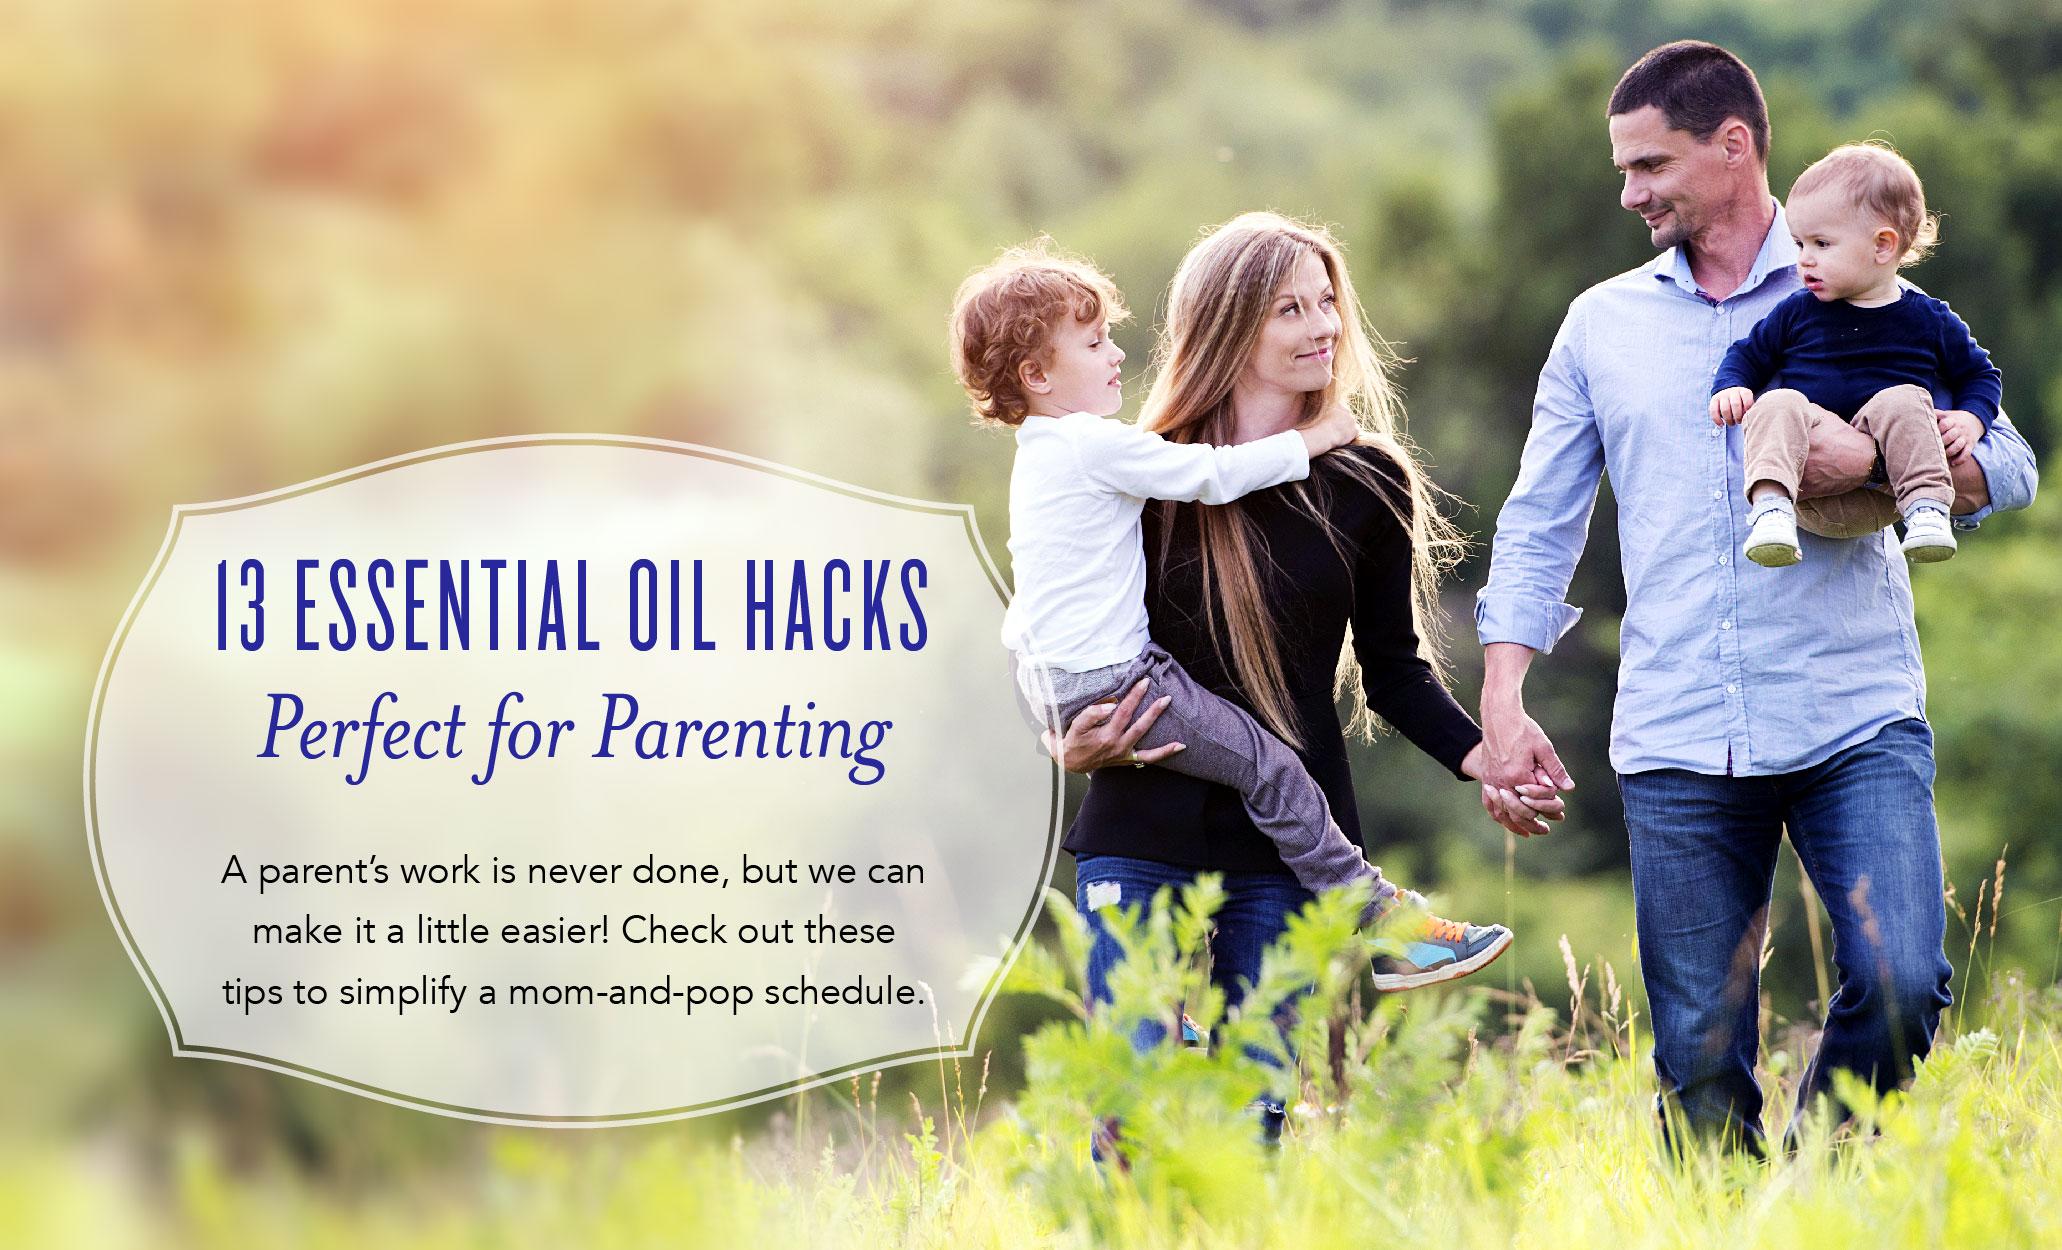 Essential Oils for Parenting